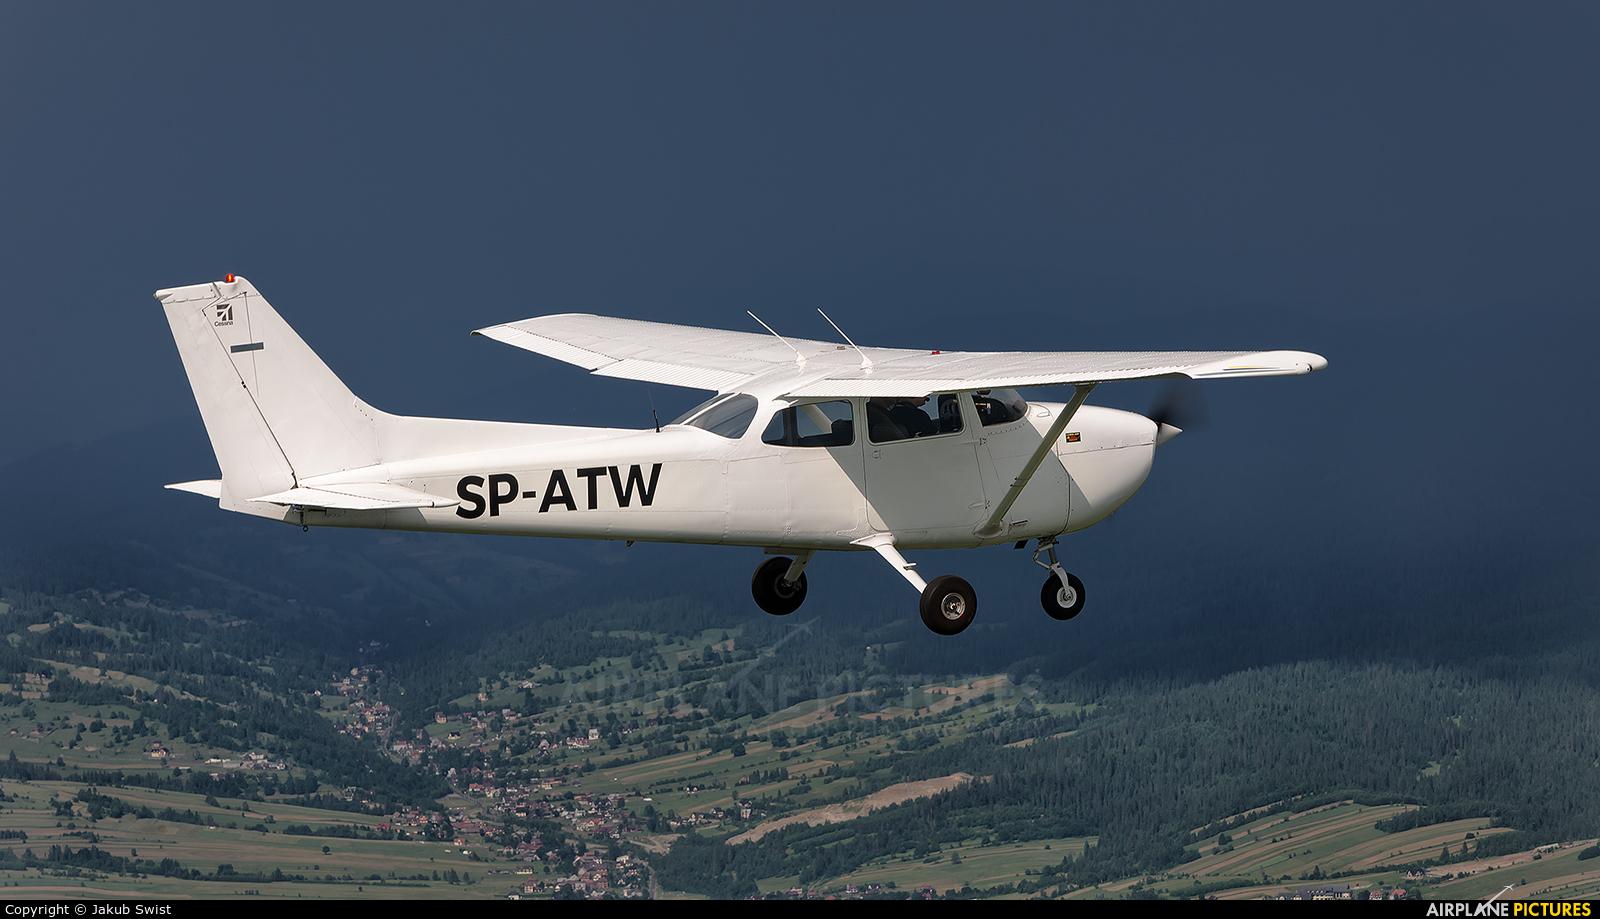 Aeroklub Nowy Targ SP-ATW aircraft at In Flight - Poland